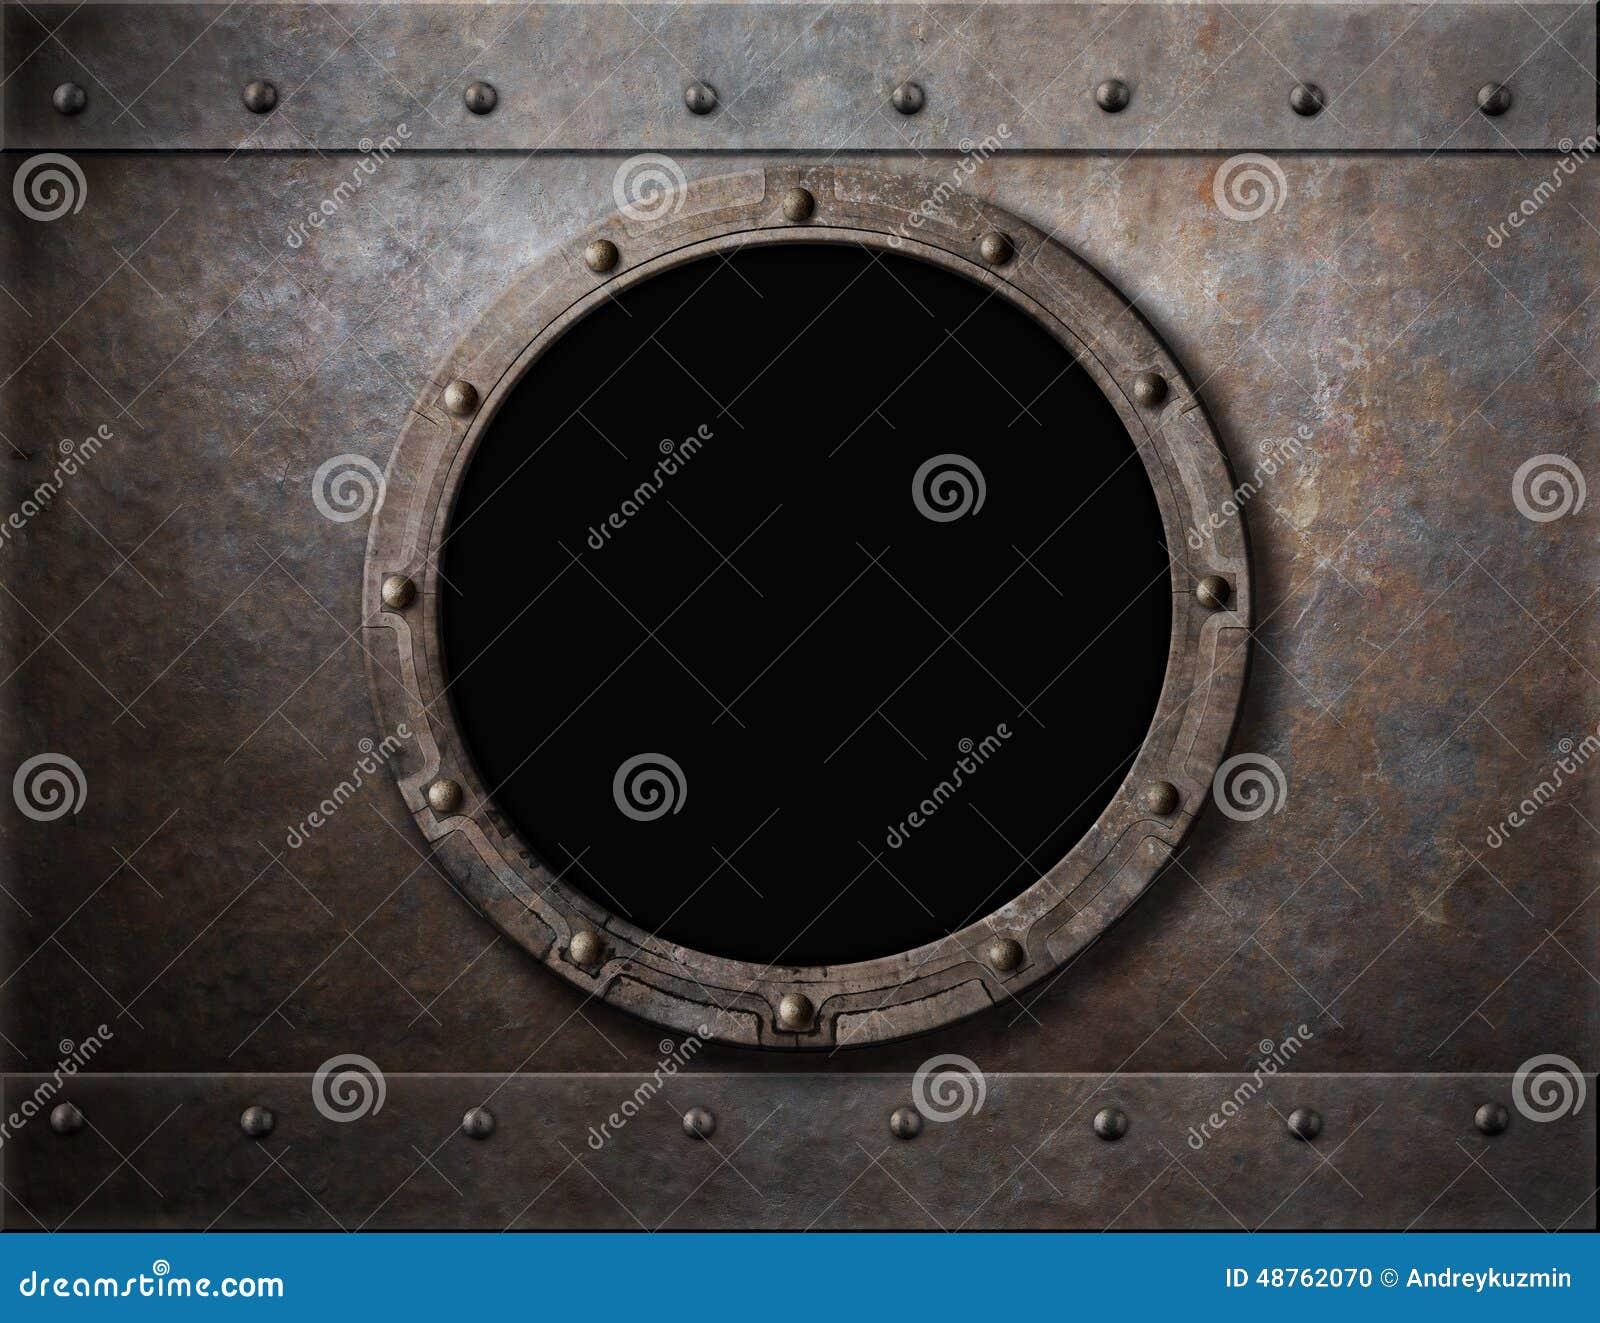 Submarine armoured porthole or window metal